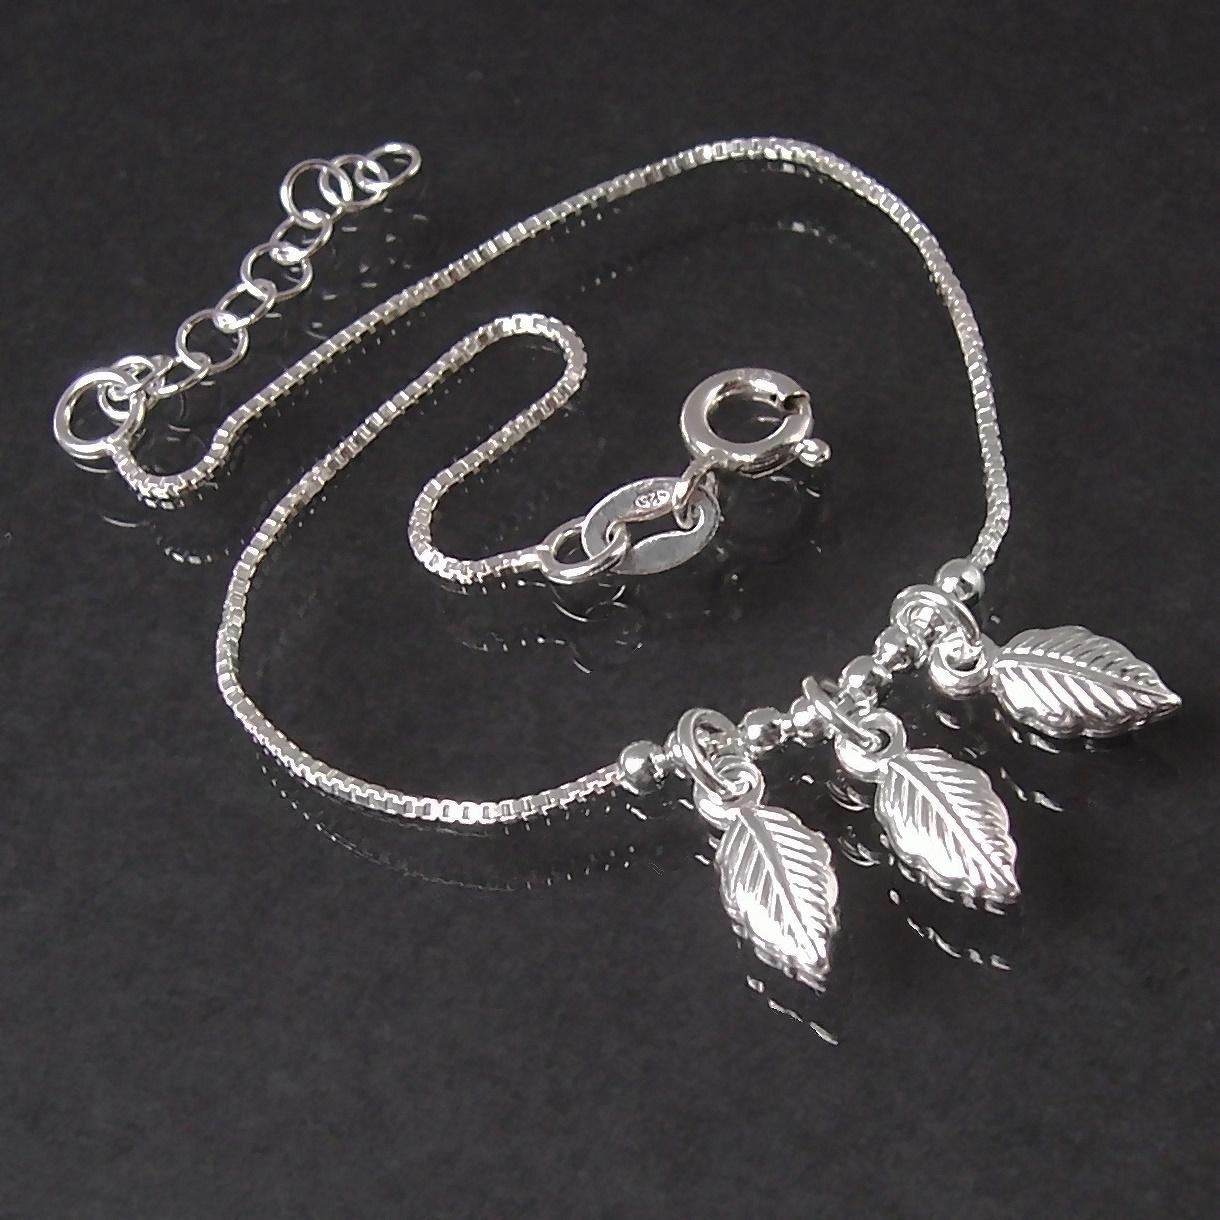 Armband Armkette 925 Silber Veneziakette 3 Blätter 17-19cm 15412-19